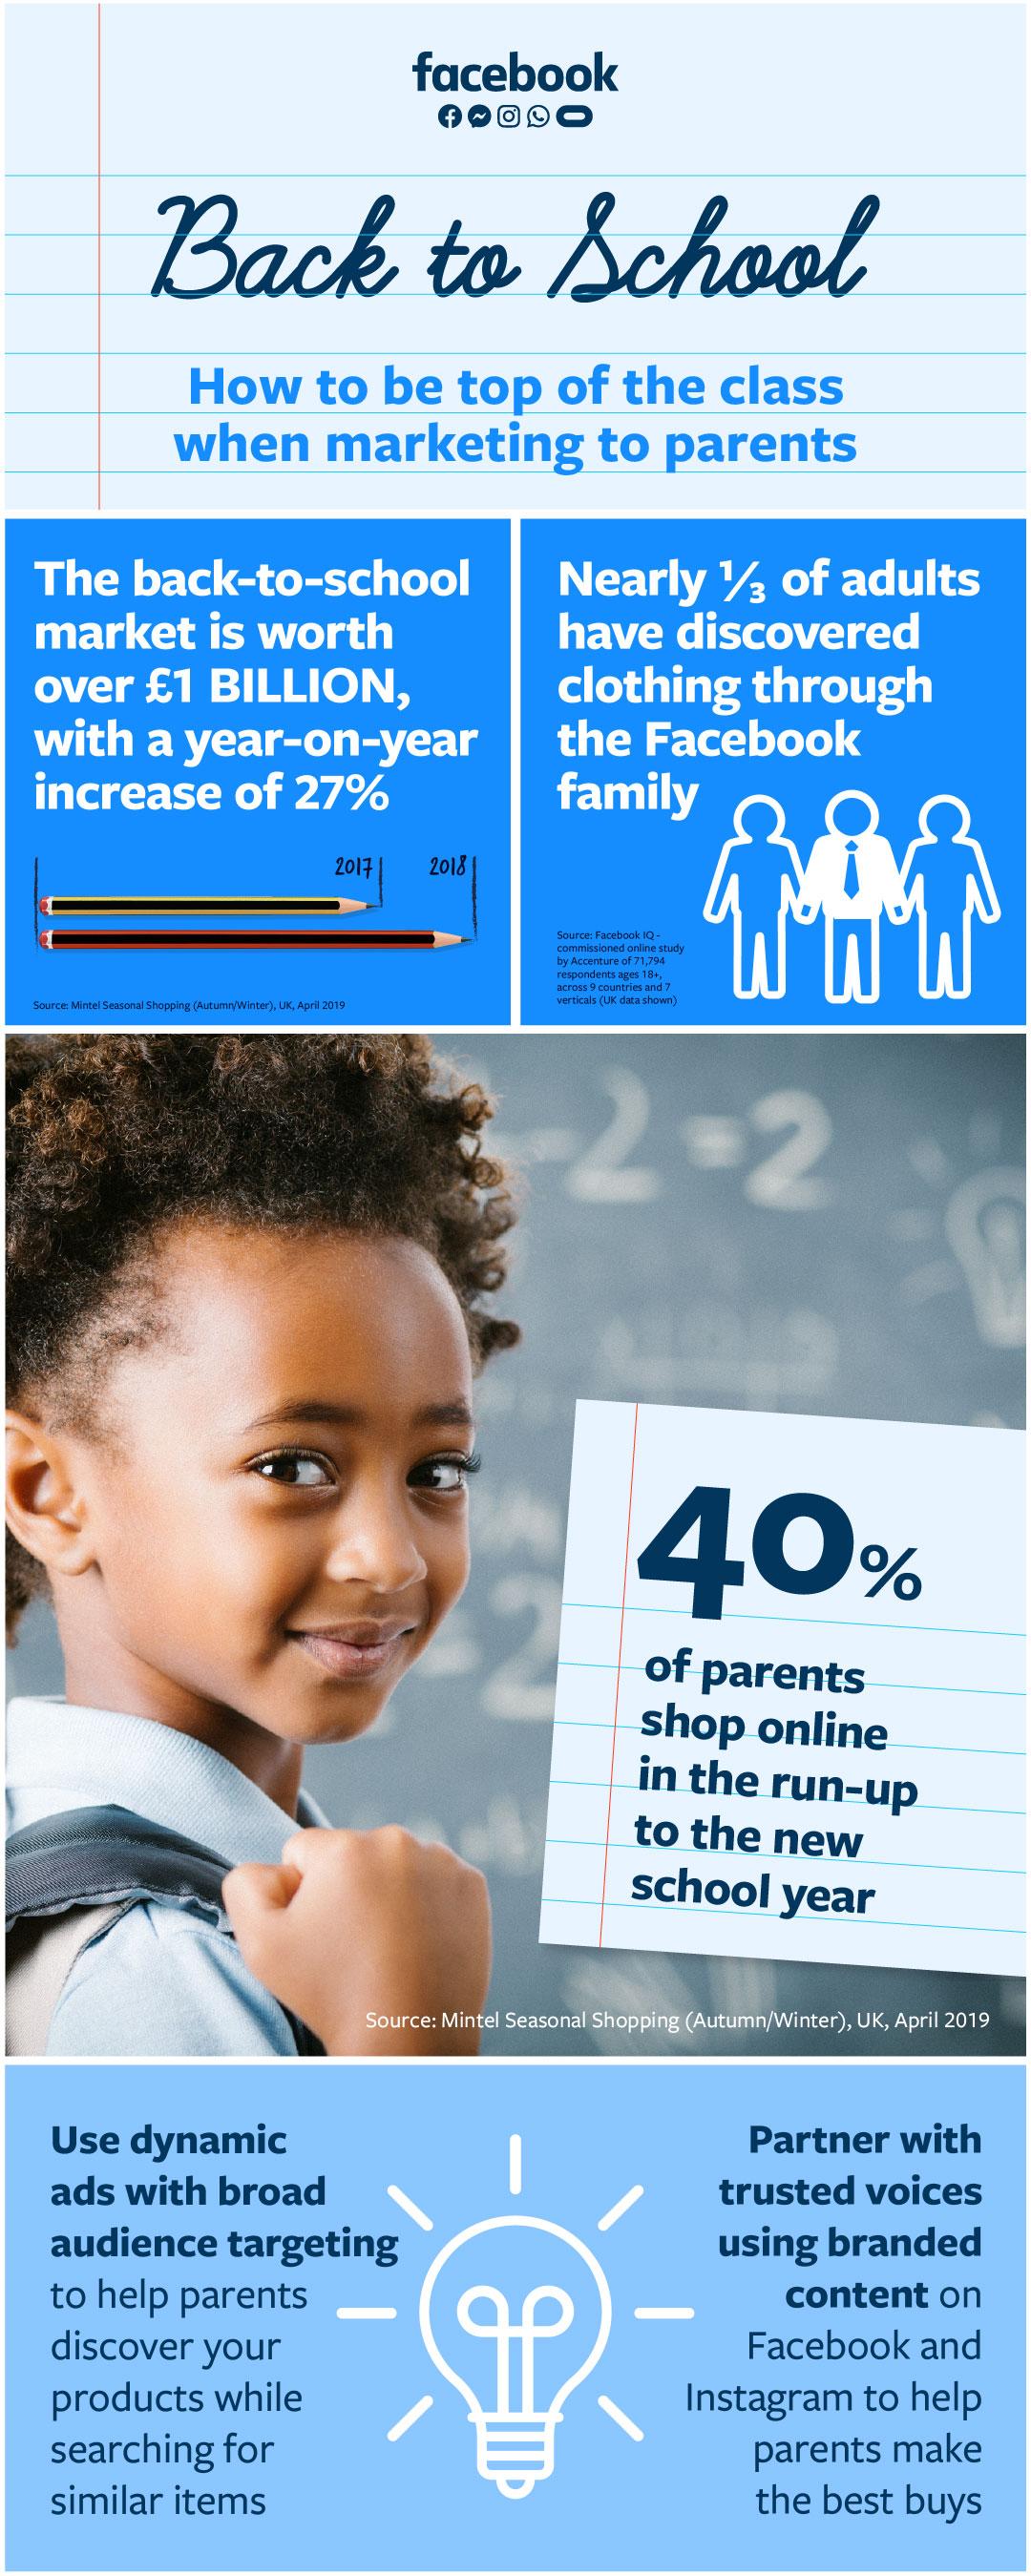 Favebook back-to-school marketing insights